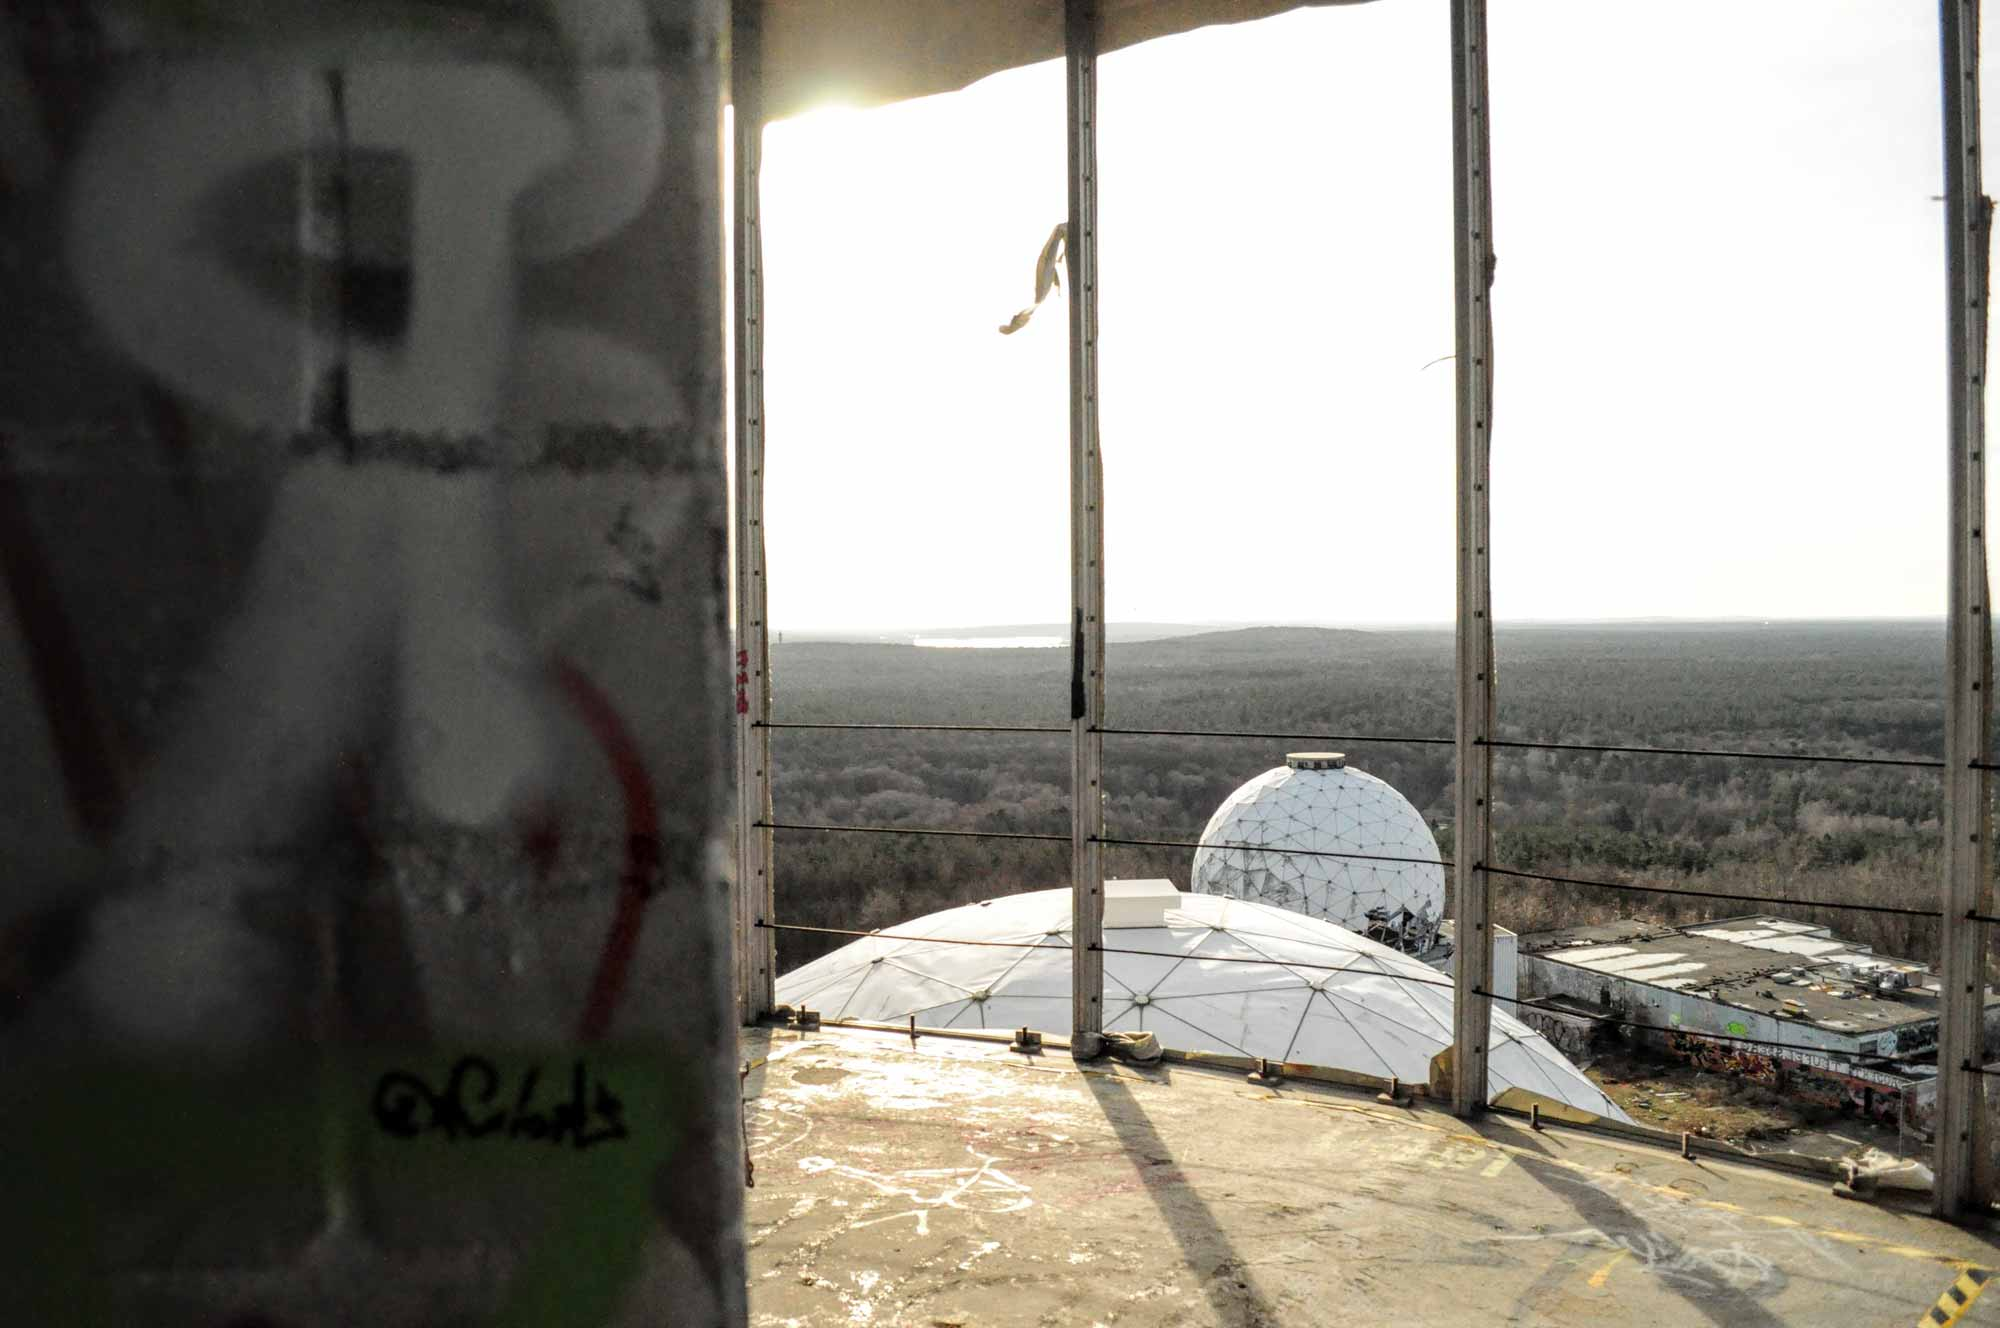 Teufelsberg Berlin - Wandern um die verlassene Abhörstation 1